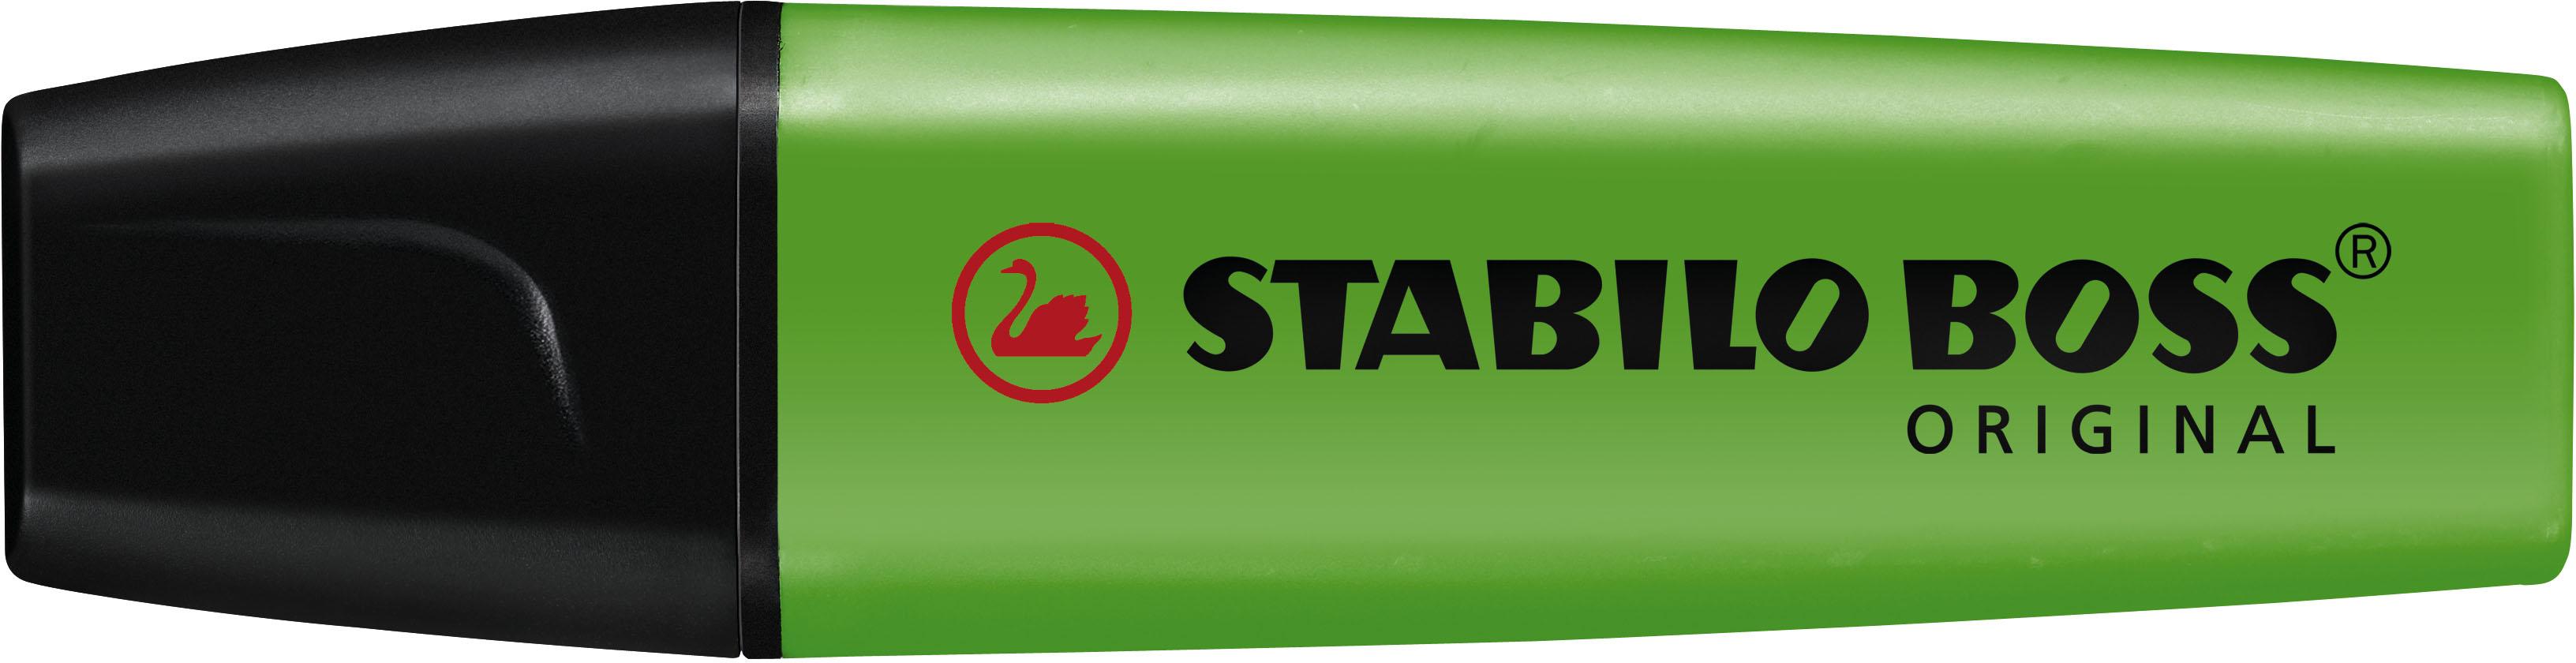 Stabilo Markeerstift BOSS 10-Pack groen